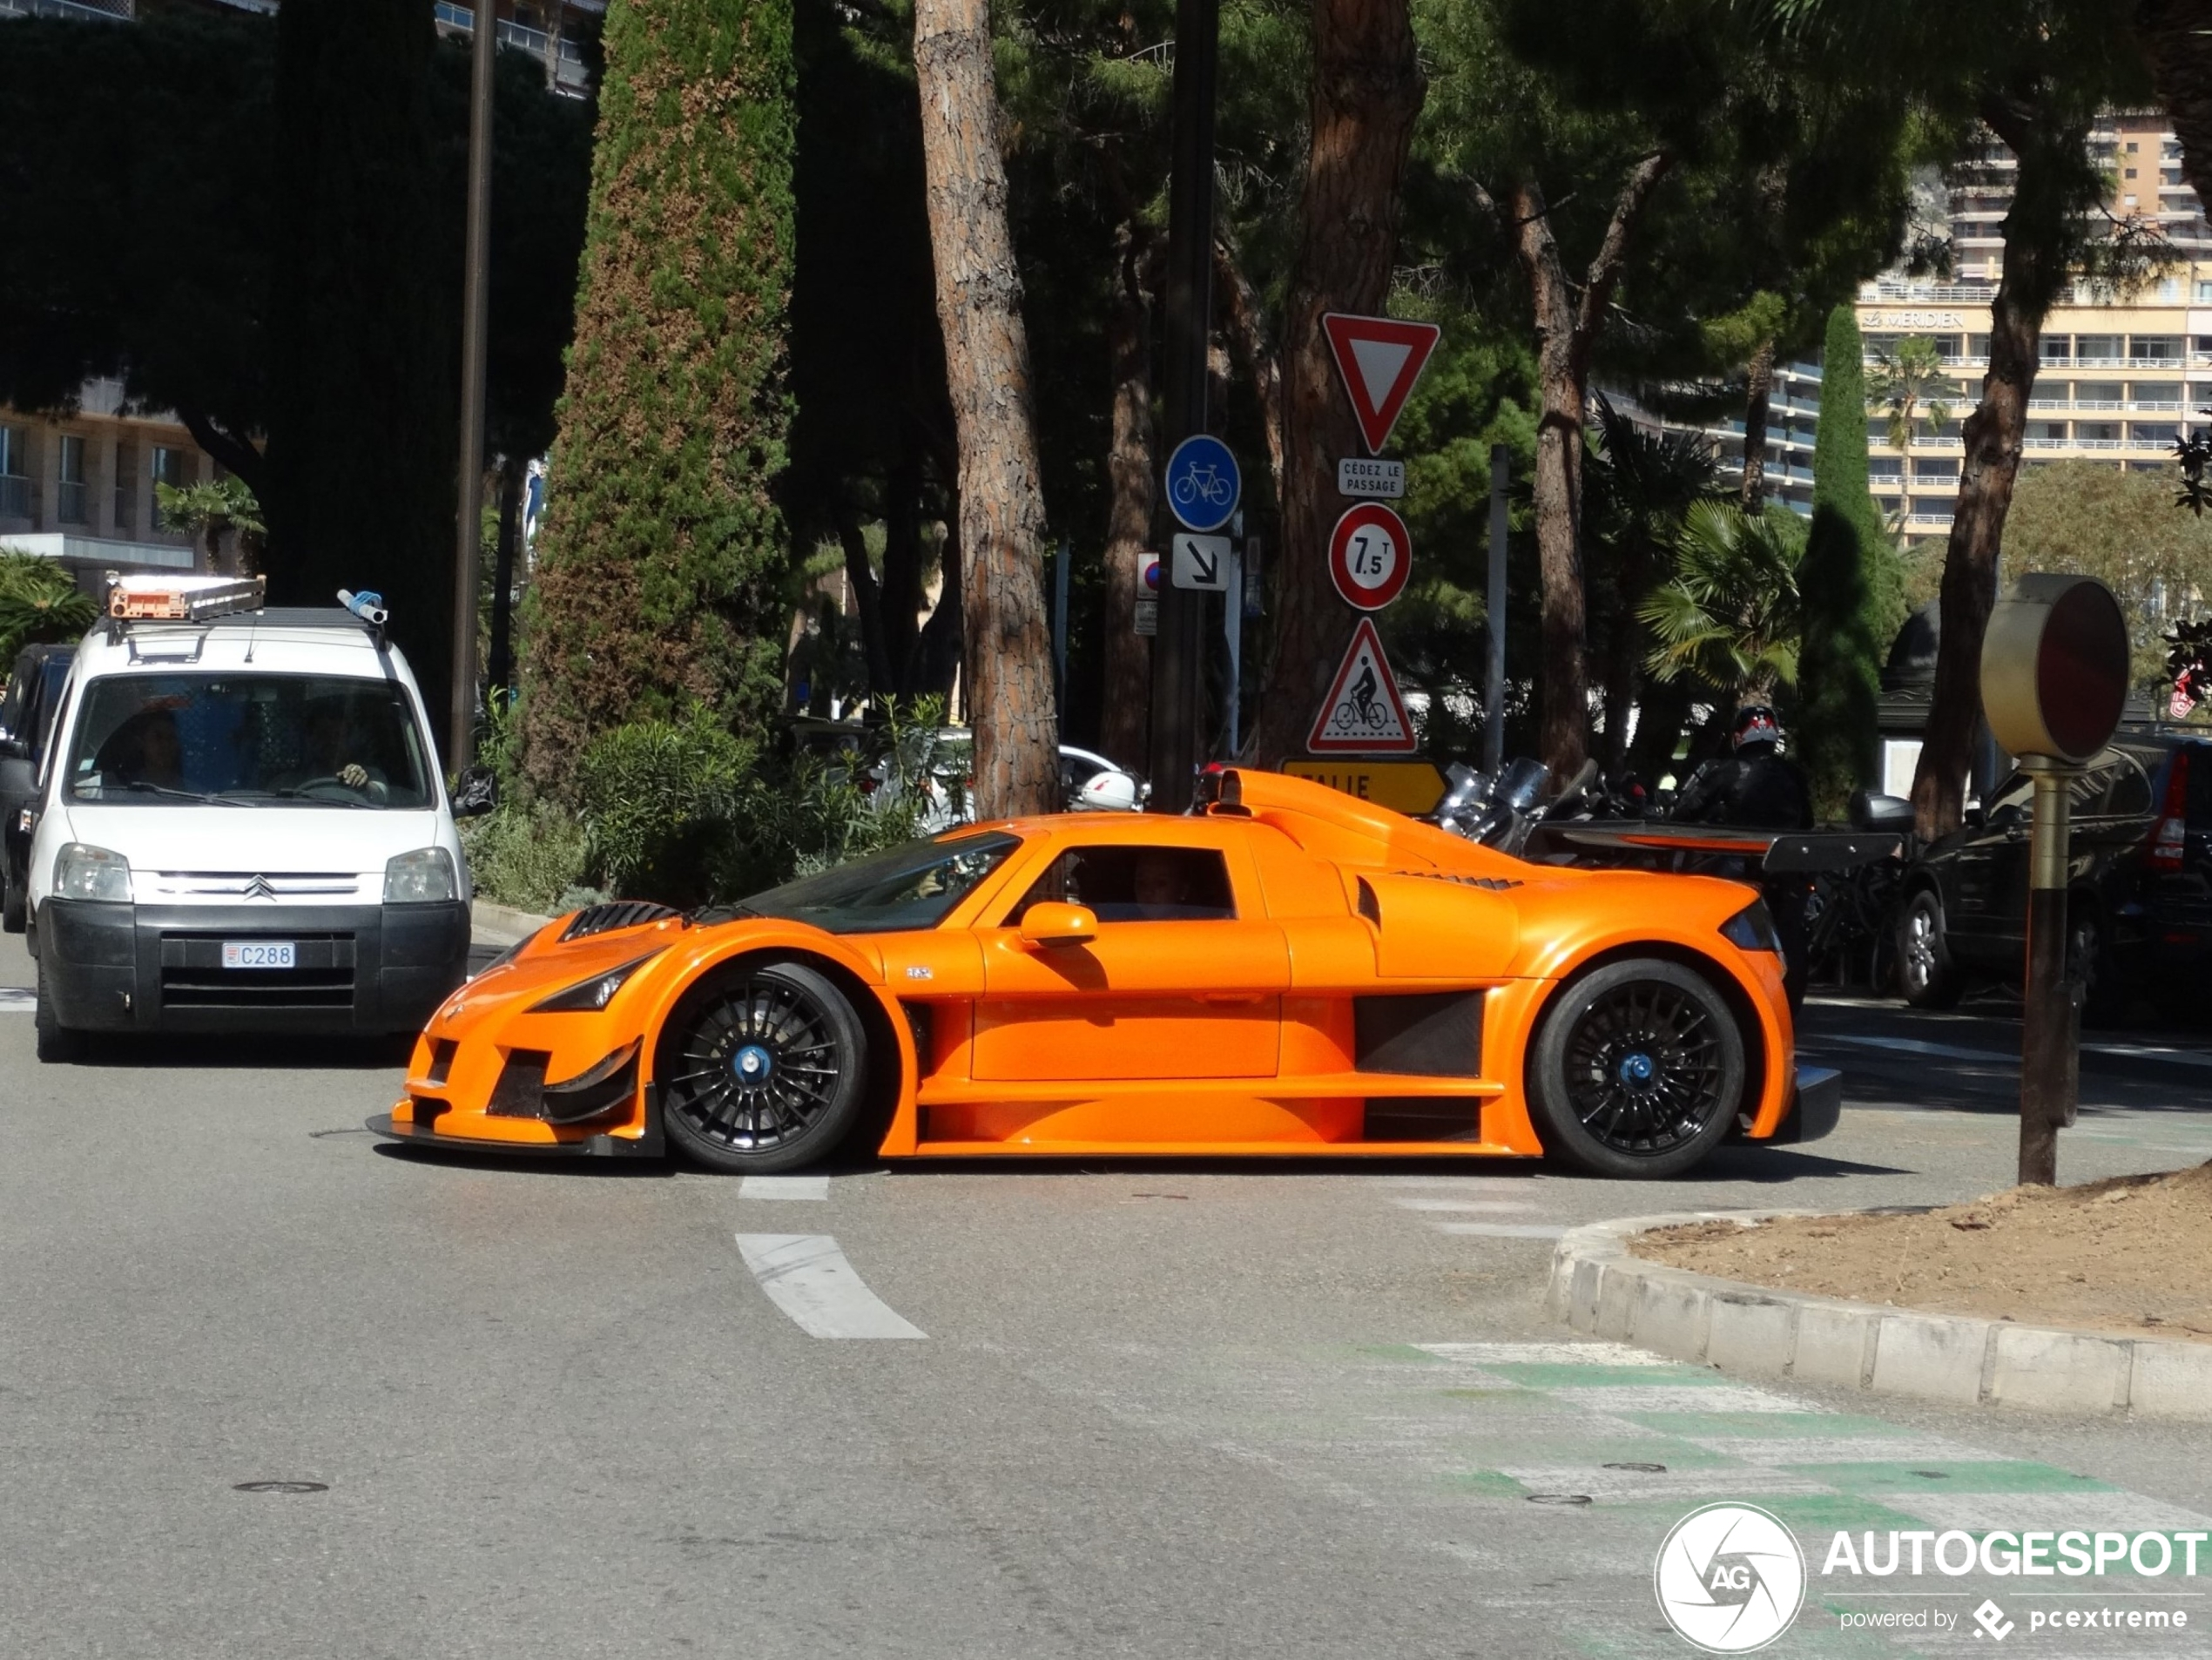 Monte Carlo Casino is de beste plek om exotische auto's te spotten